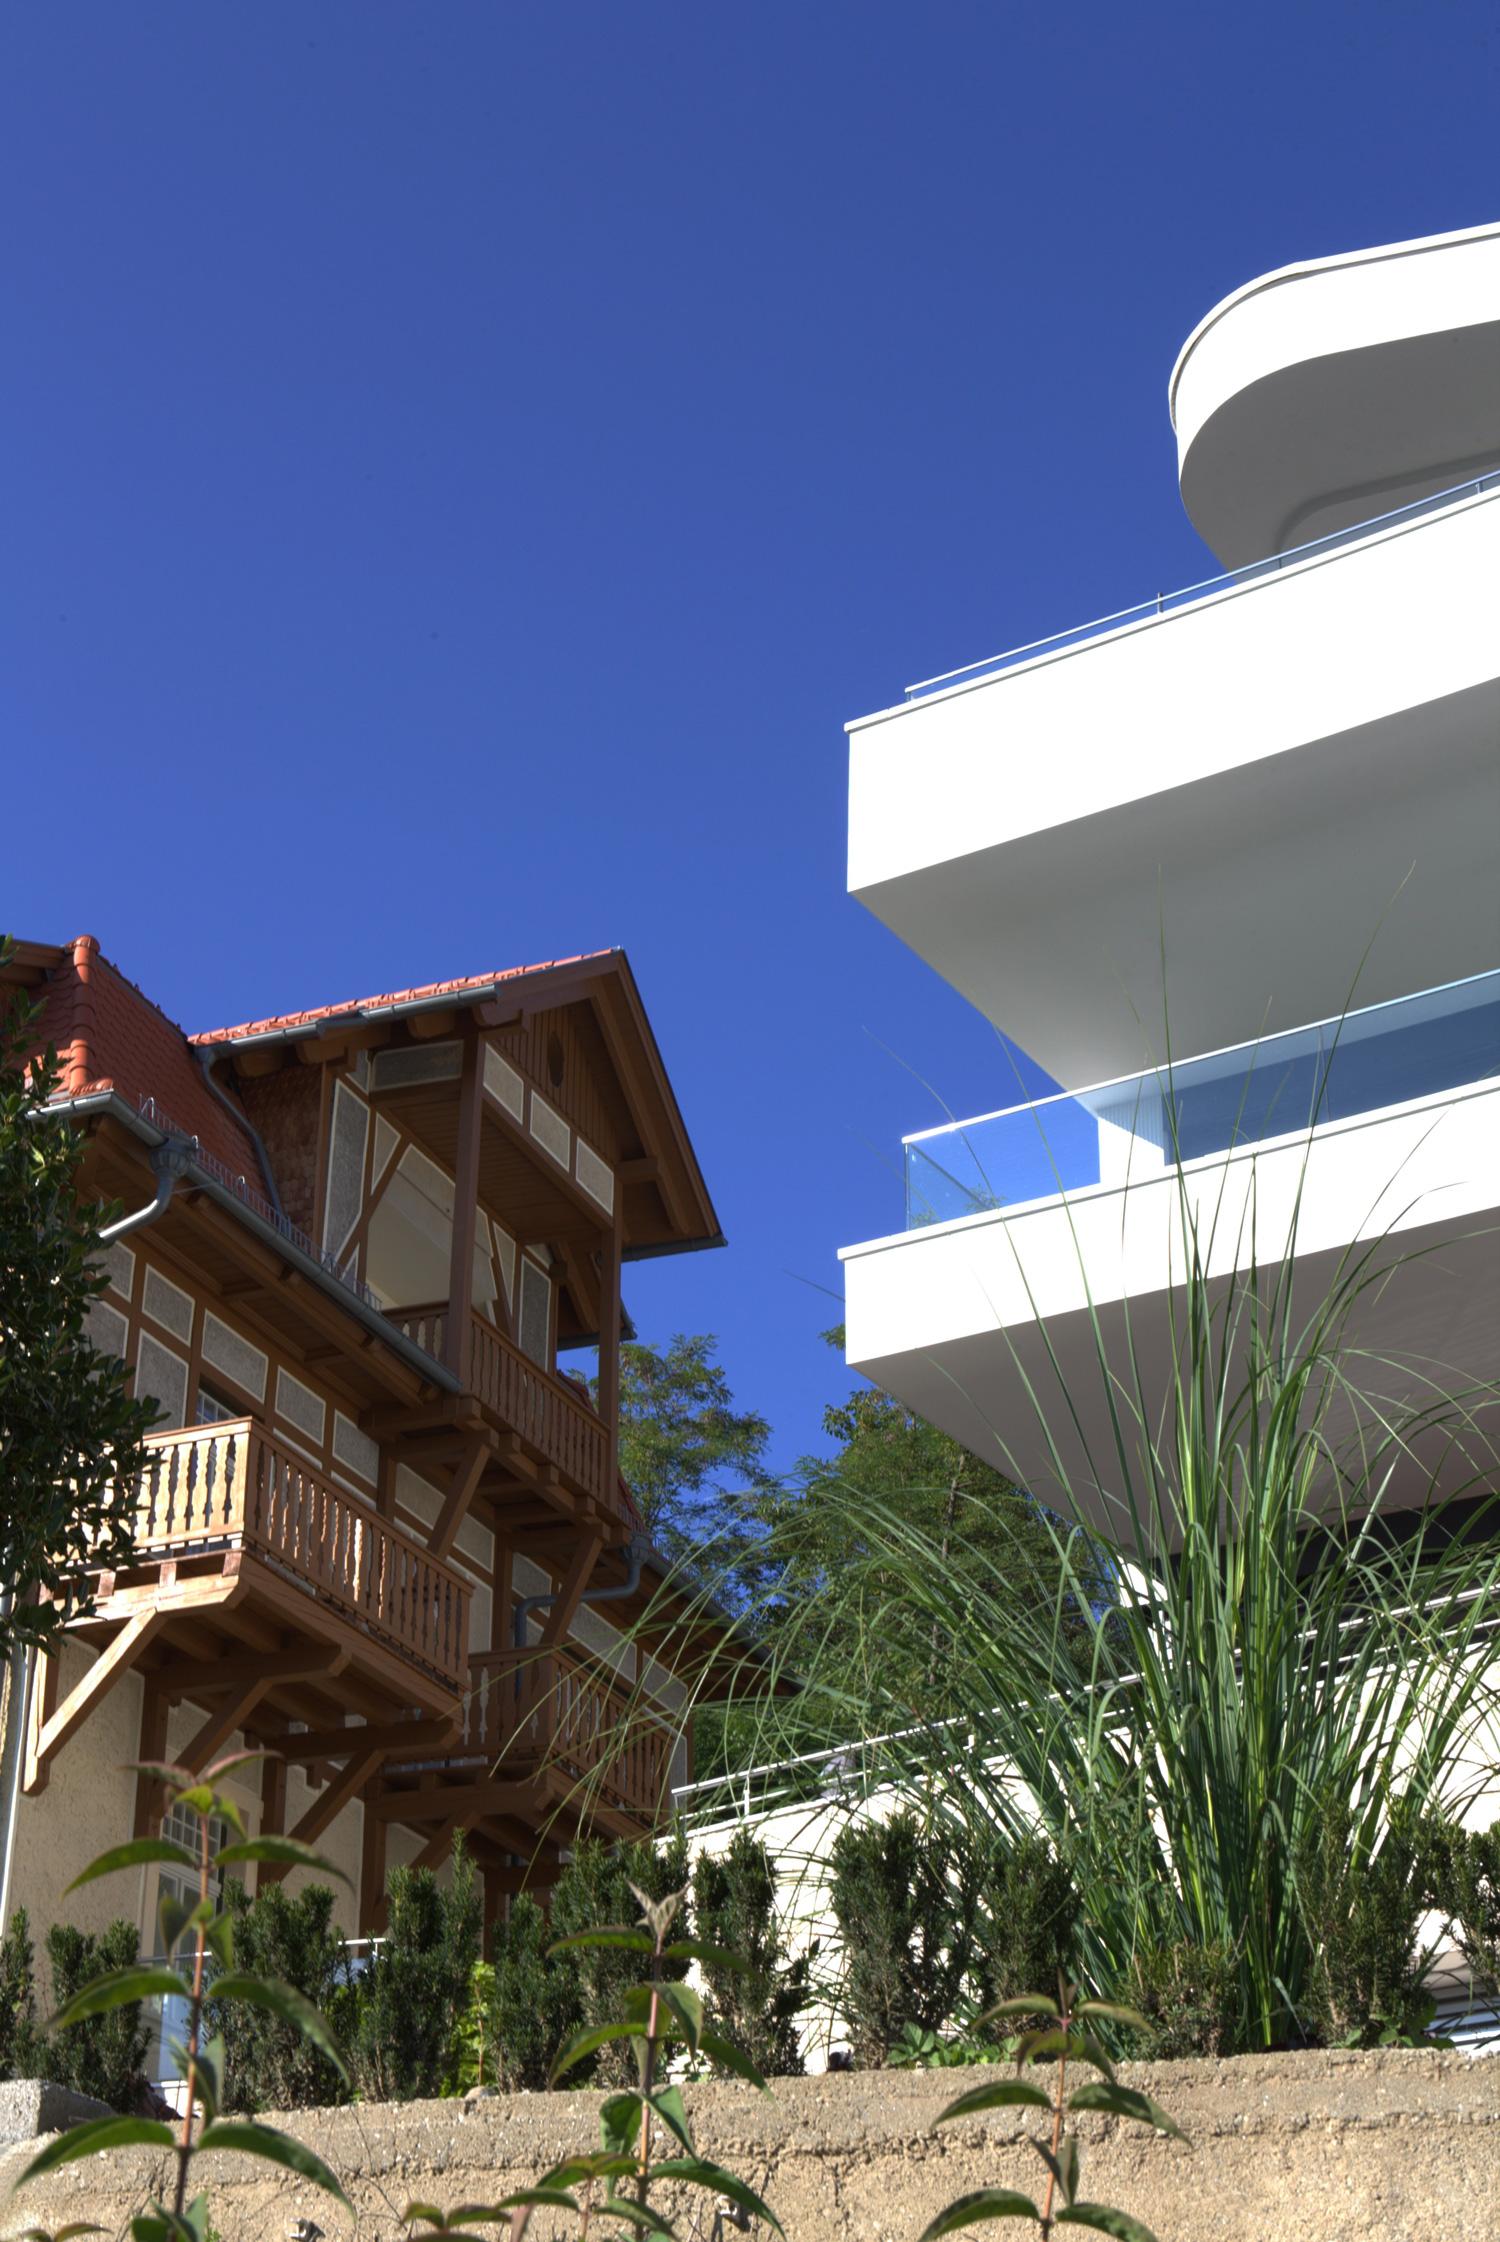 A01 architects - The Millstatt_(c) Nadine Blanchard__web03.jpg